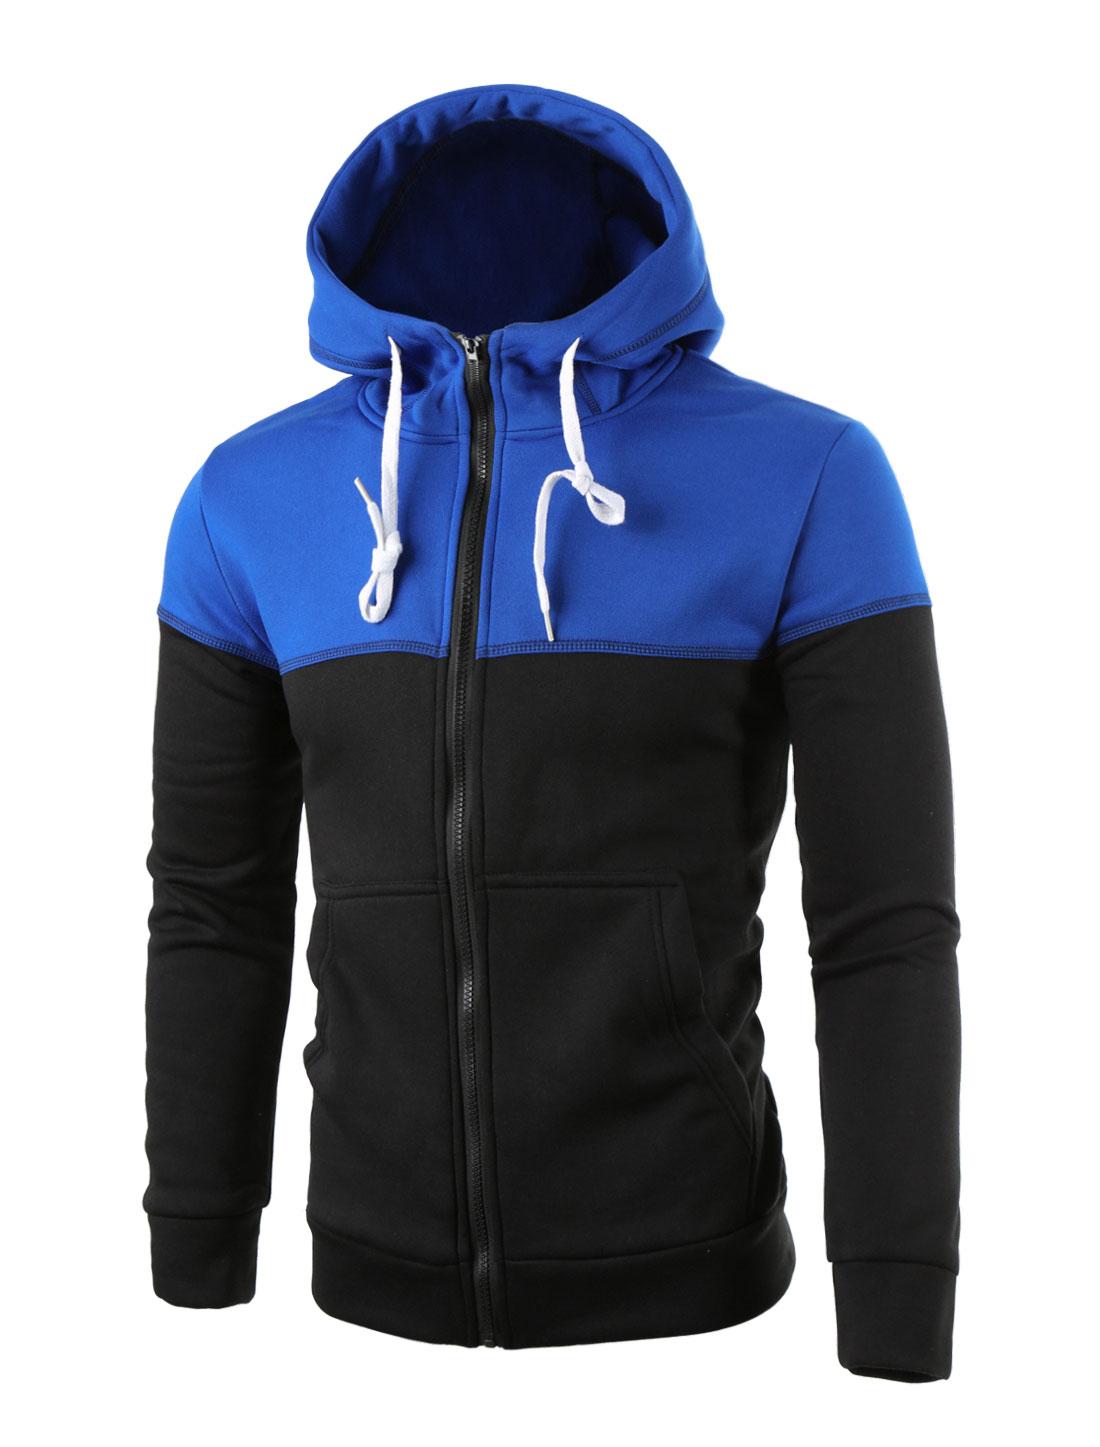 Men Long Sleeves Drawstring Hooded Front Pockets S Blue